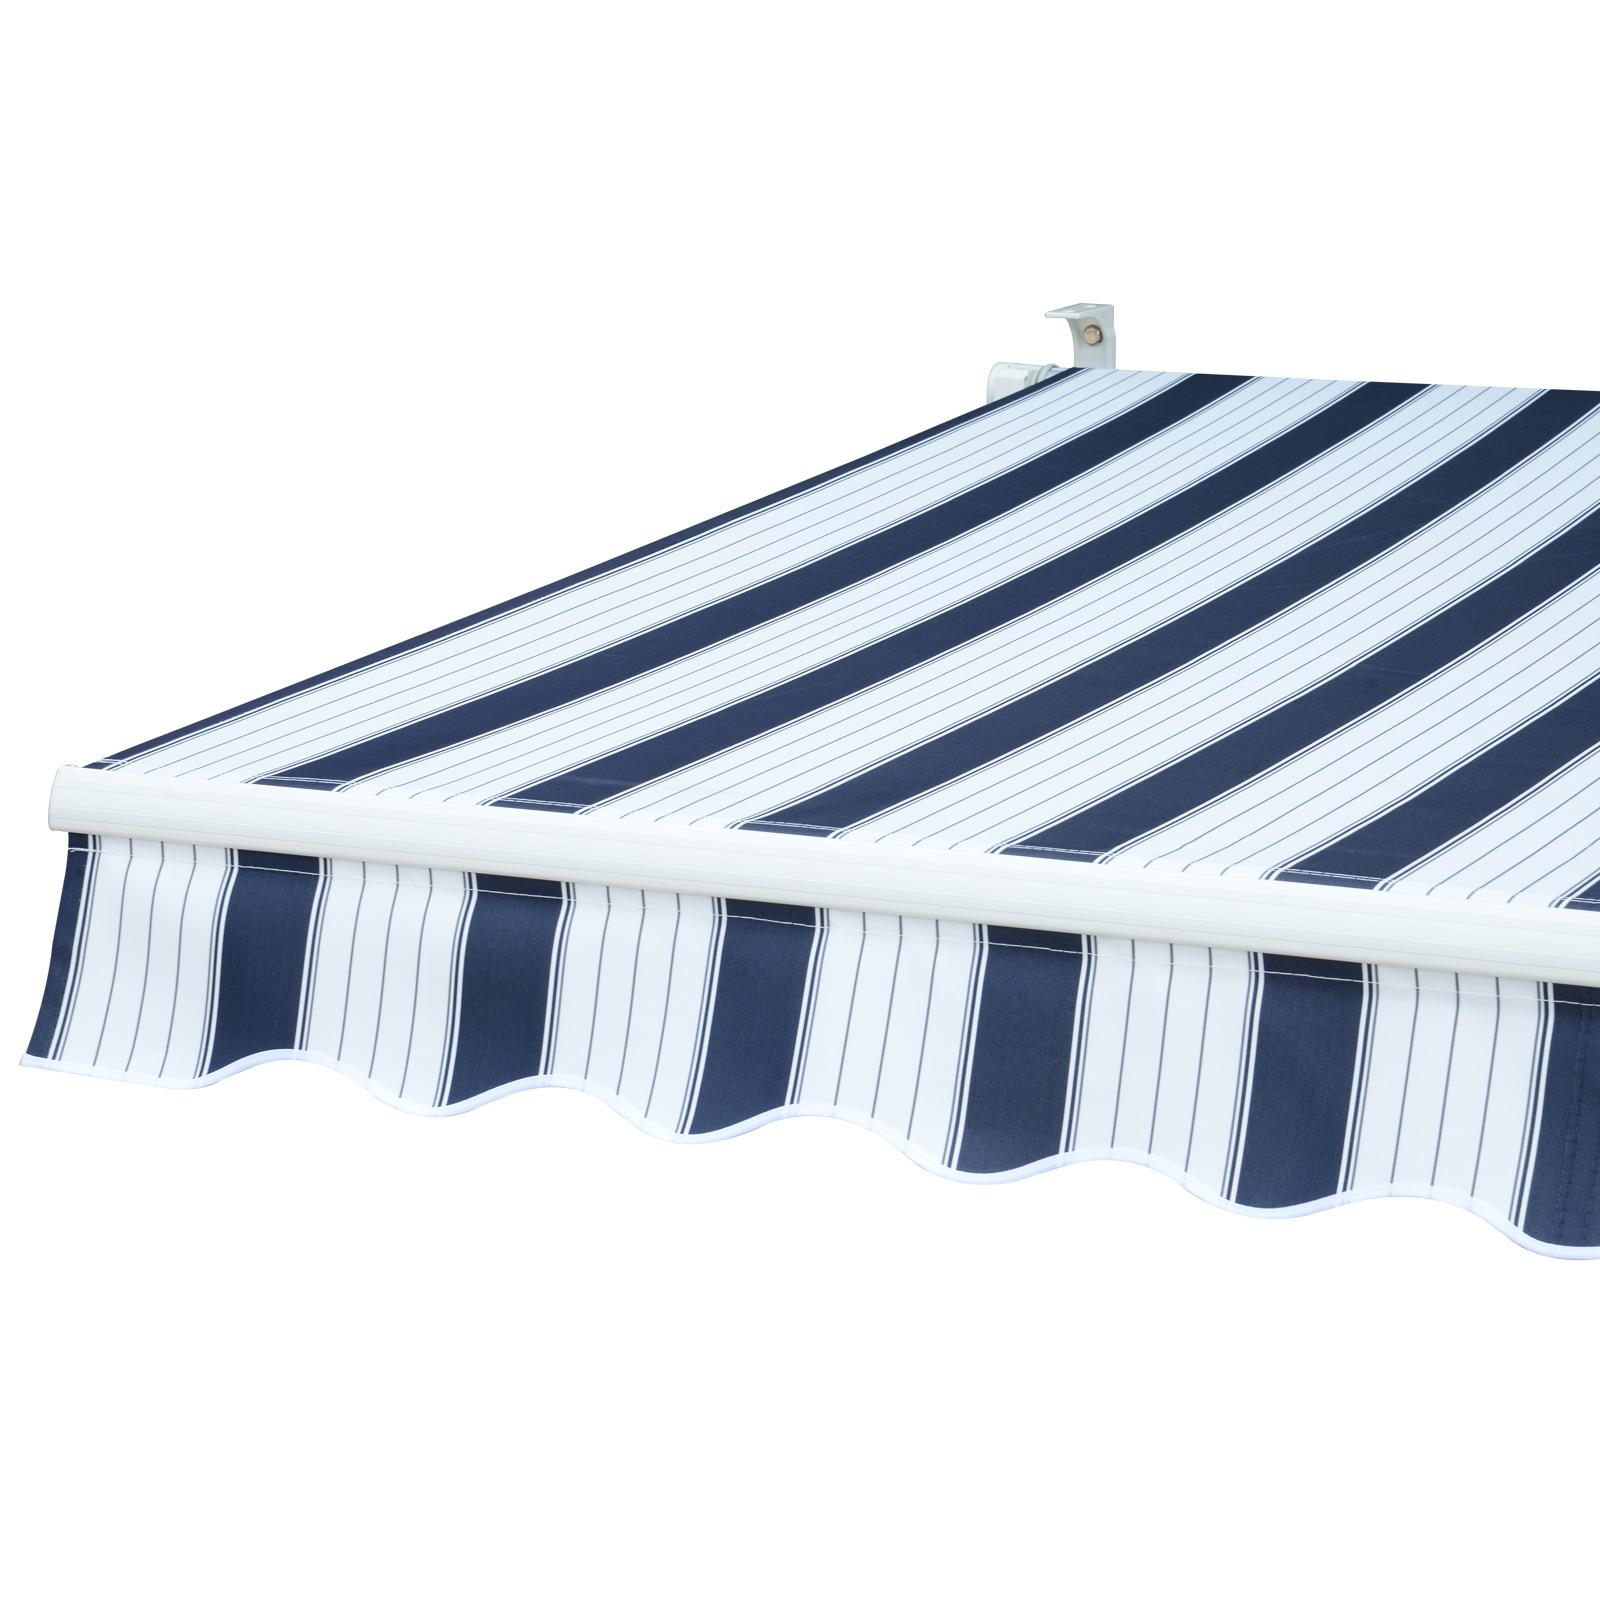 Garden-Patio-Manual-Awning-Canopy-Sun-Shade-Shelter-Retractable-4-Size-5-Colour thumbnail 9